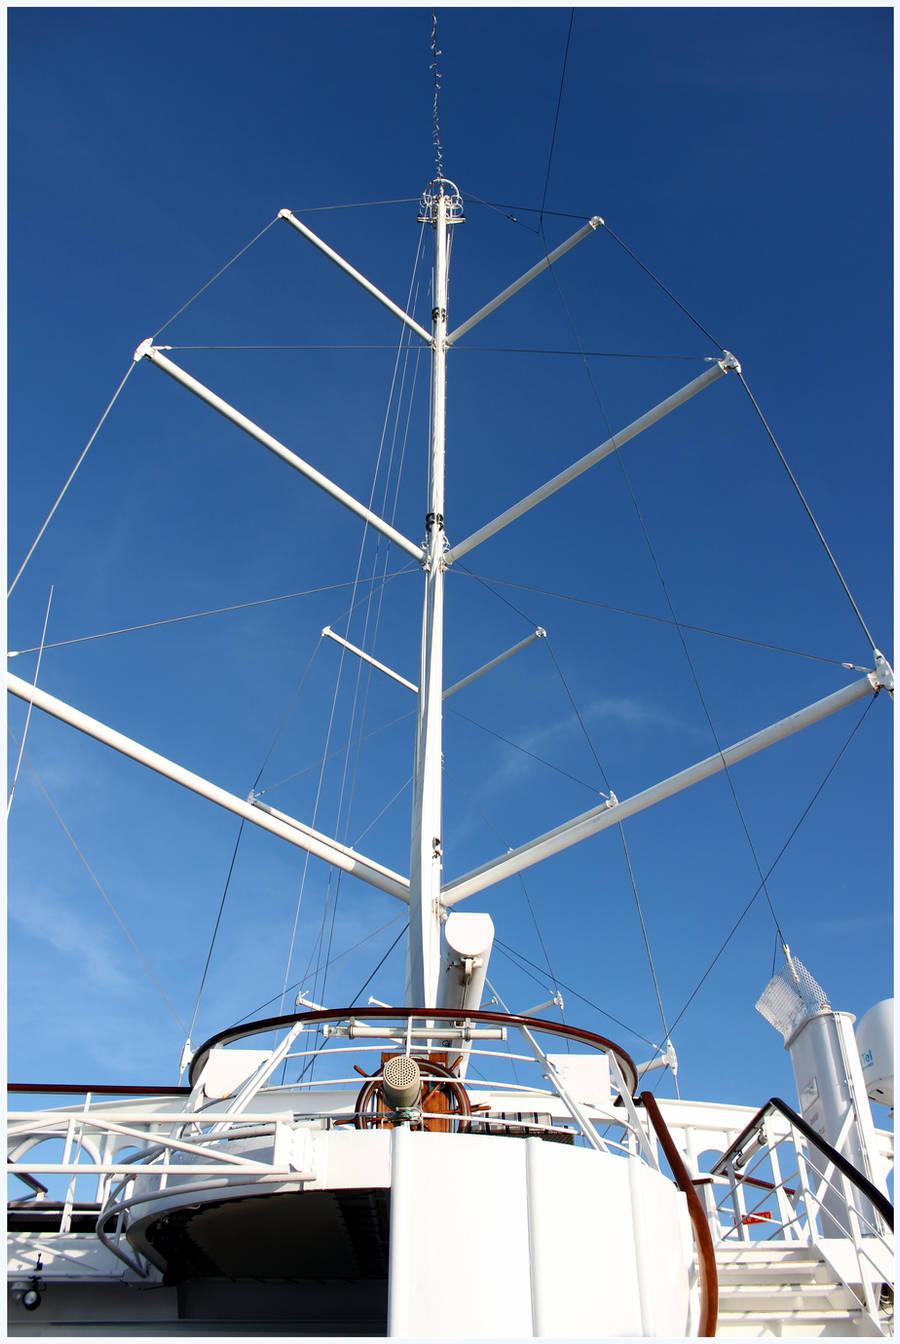 Windy Masts by kamuidestiny